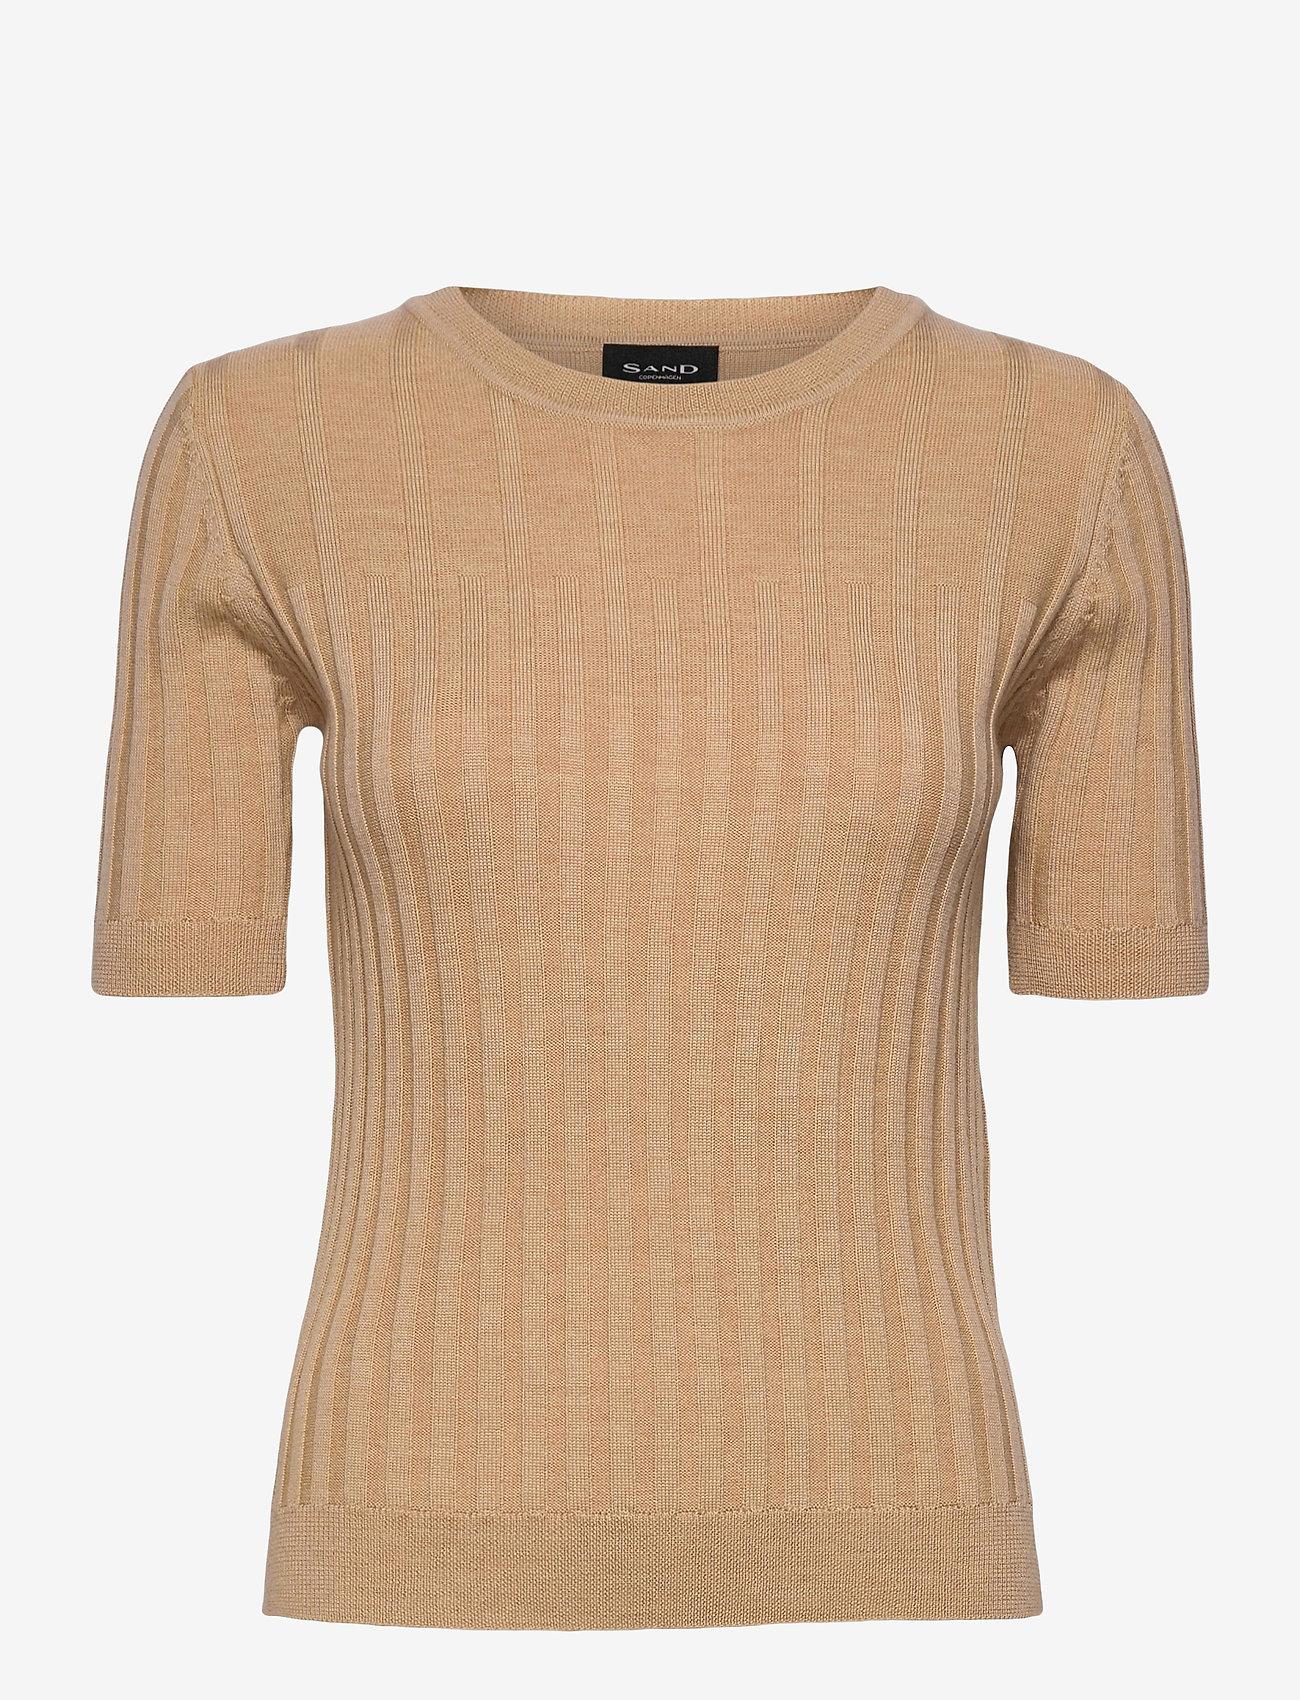 SAND - Fellini F - Leanna - gebreide t-shirts - light camel - 0